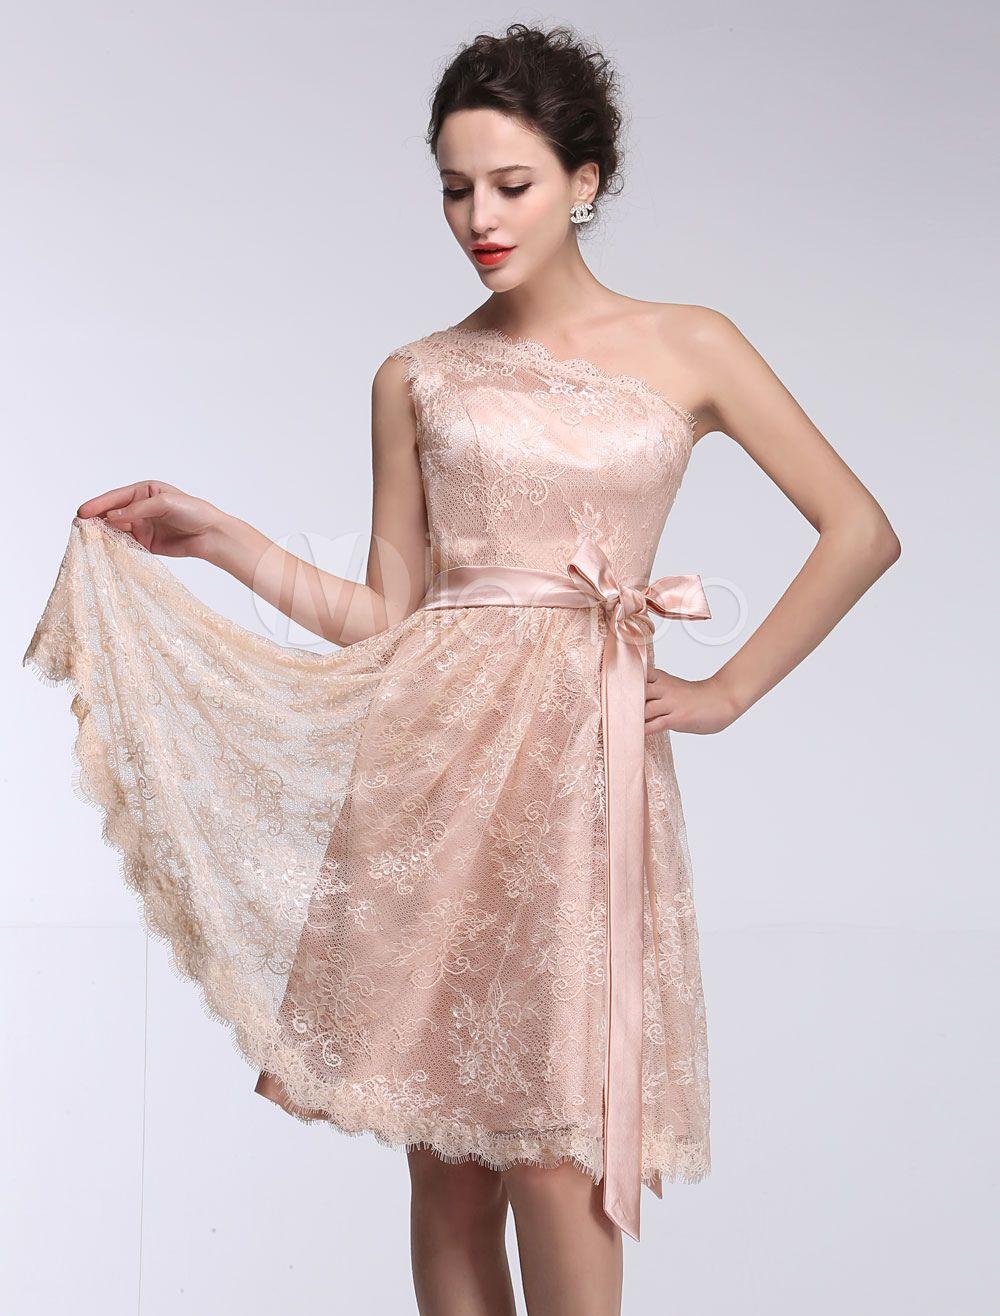 83995bcb3338 Pink Bridesmaid Dress Lace One Shoulder Short Prom Dress Sleeveless A Line  Ribbon Bow Sash Knee Length Party Dress #Shoulder, #Short, #Prom